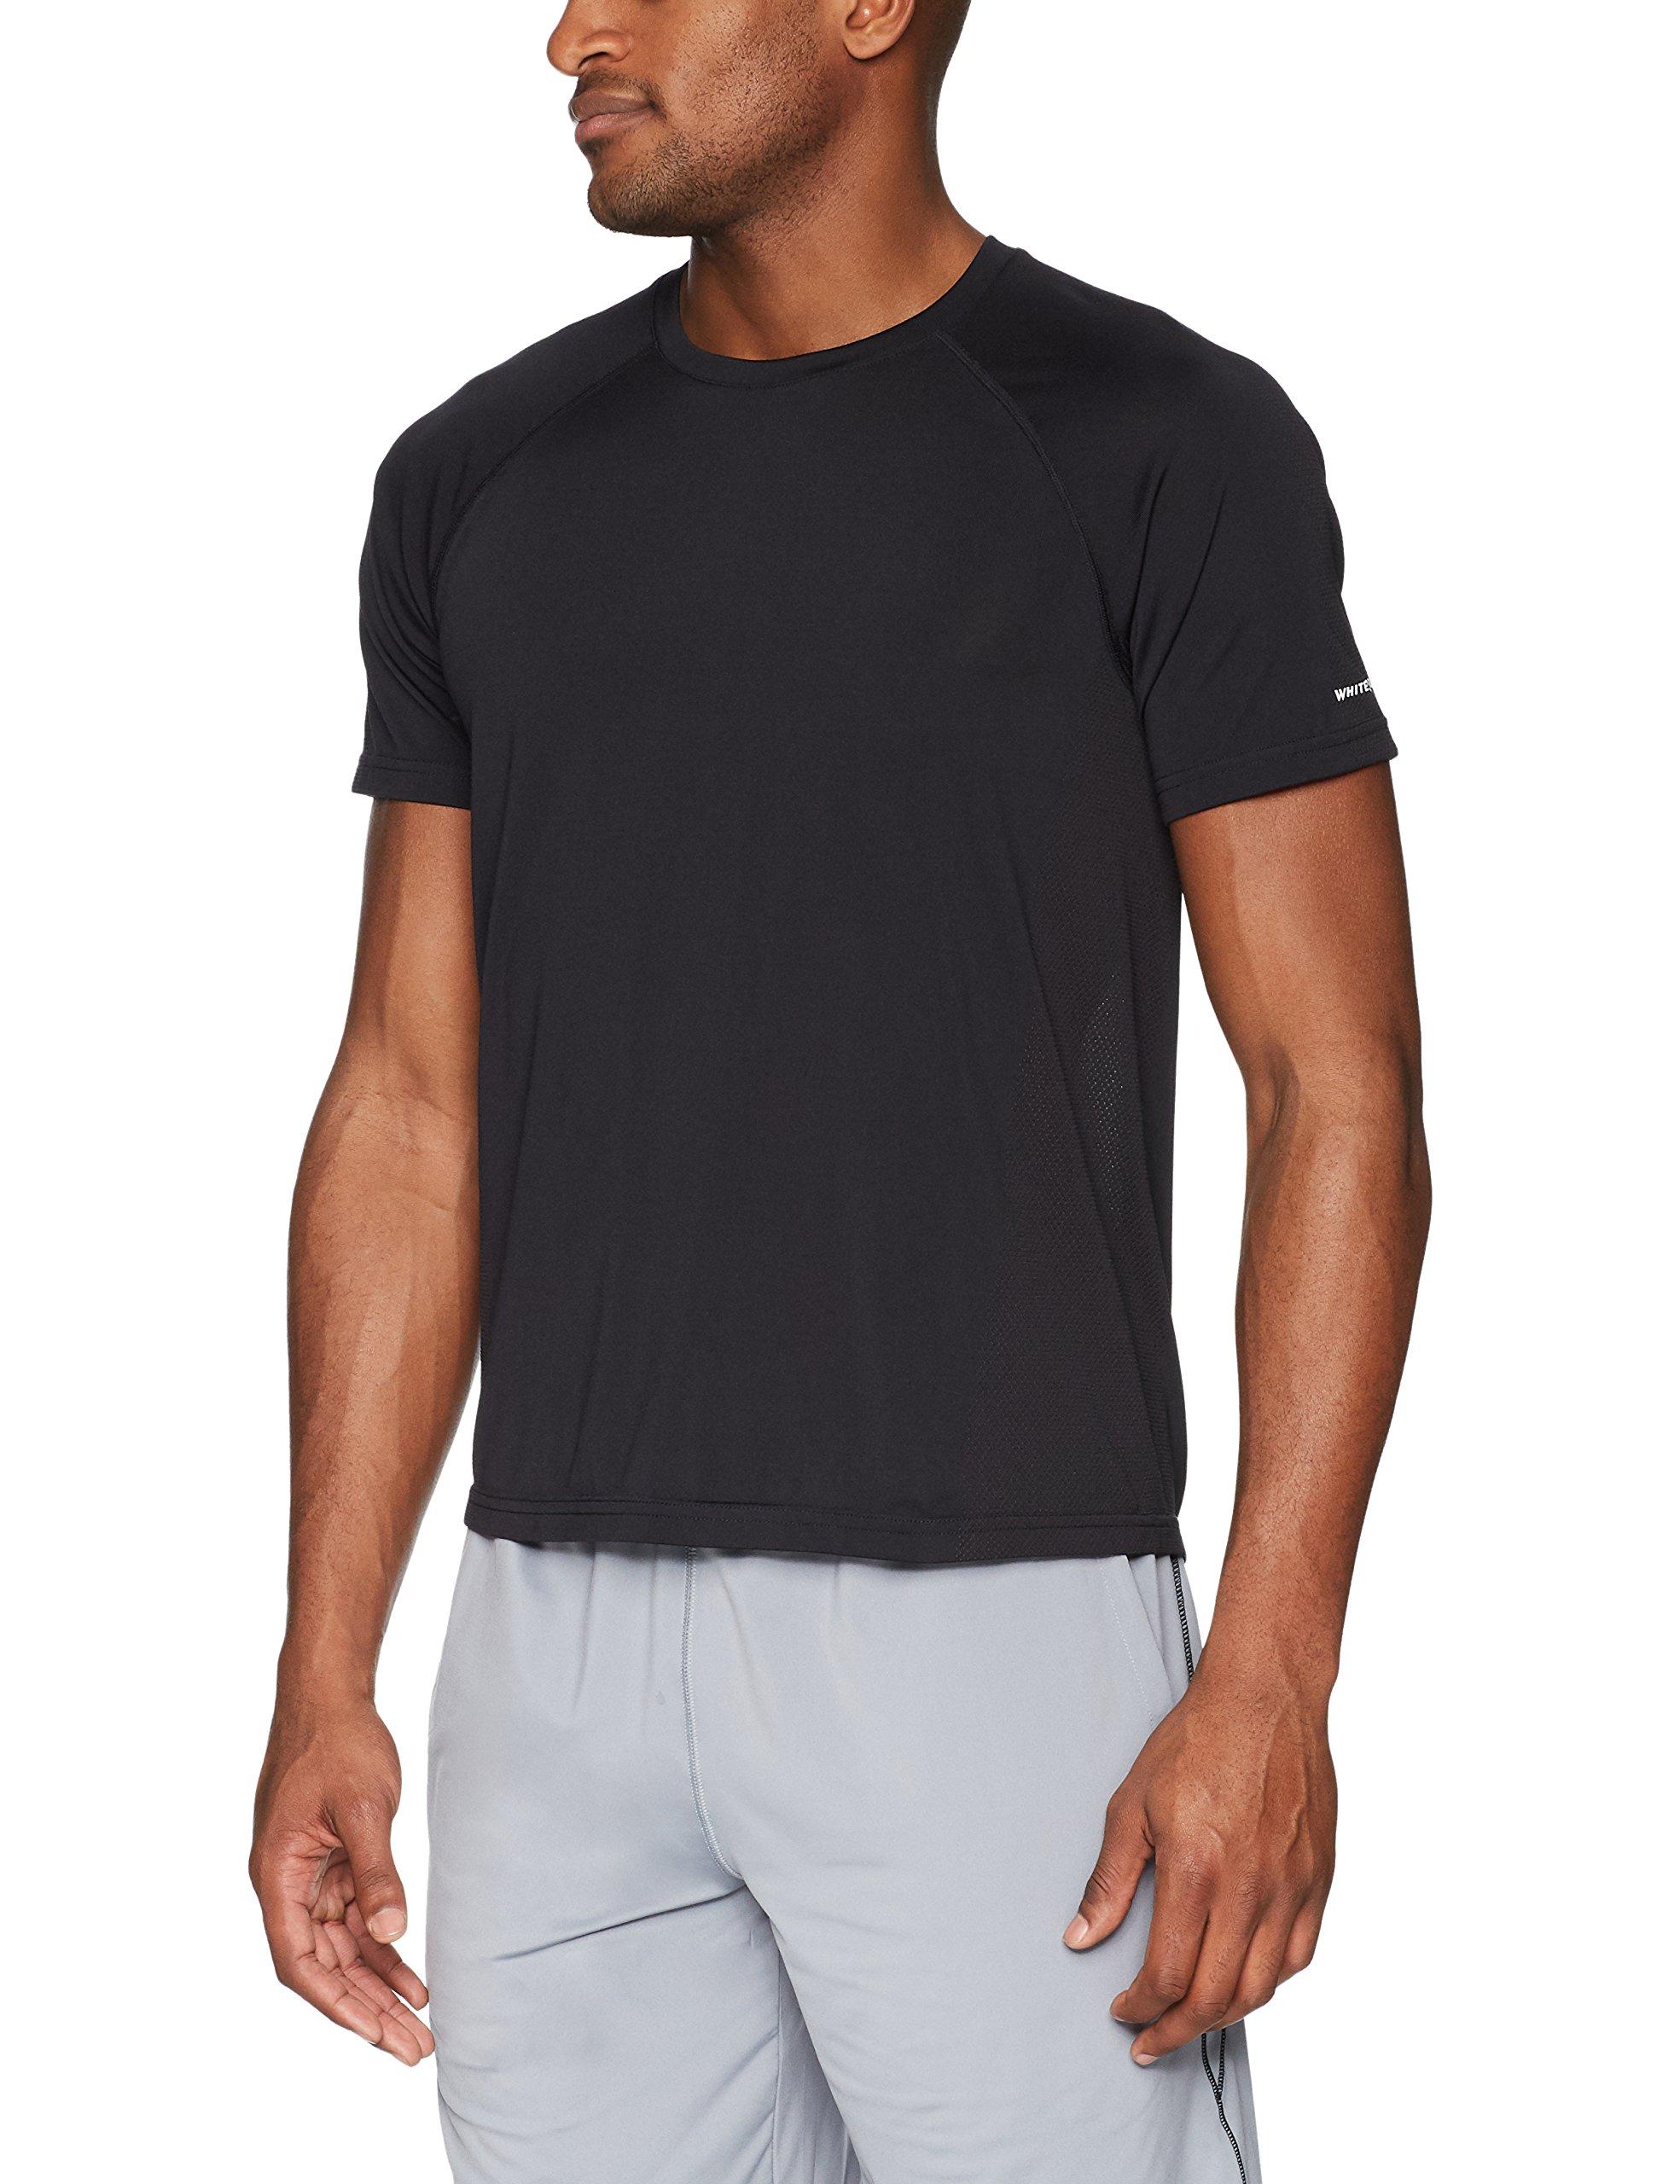 White Sierra Techno Ii Seamless Short Sleeve Tee, Black, Medium